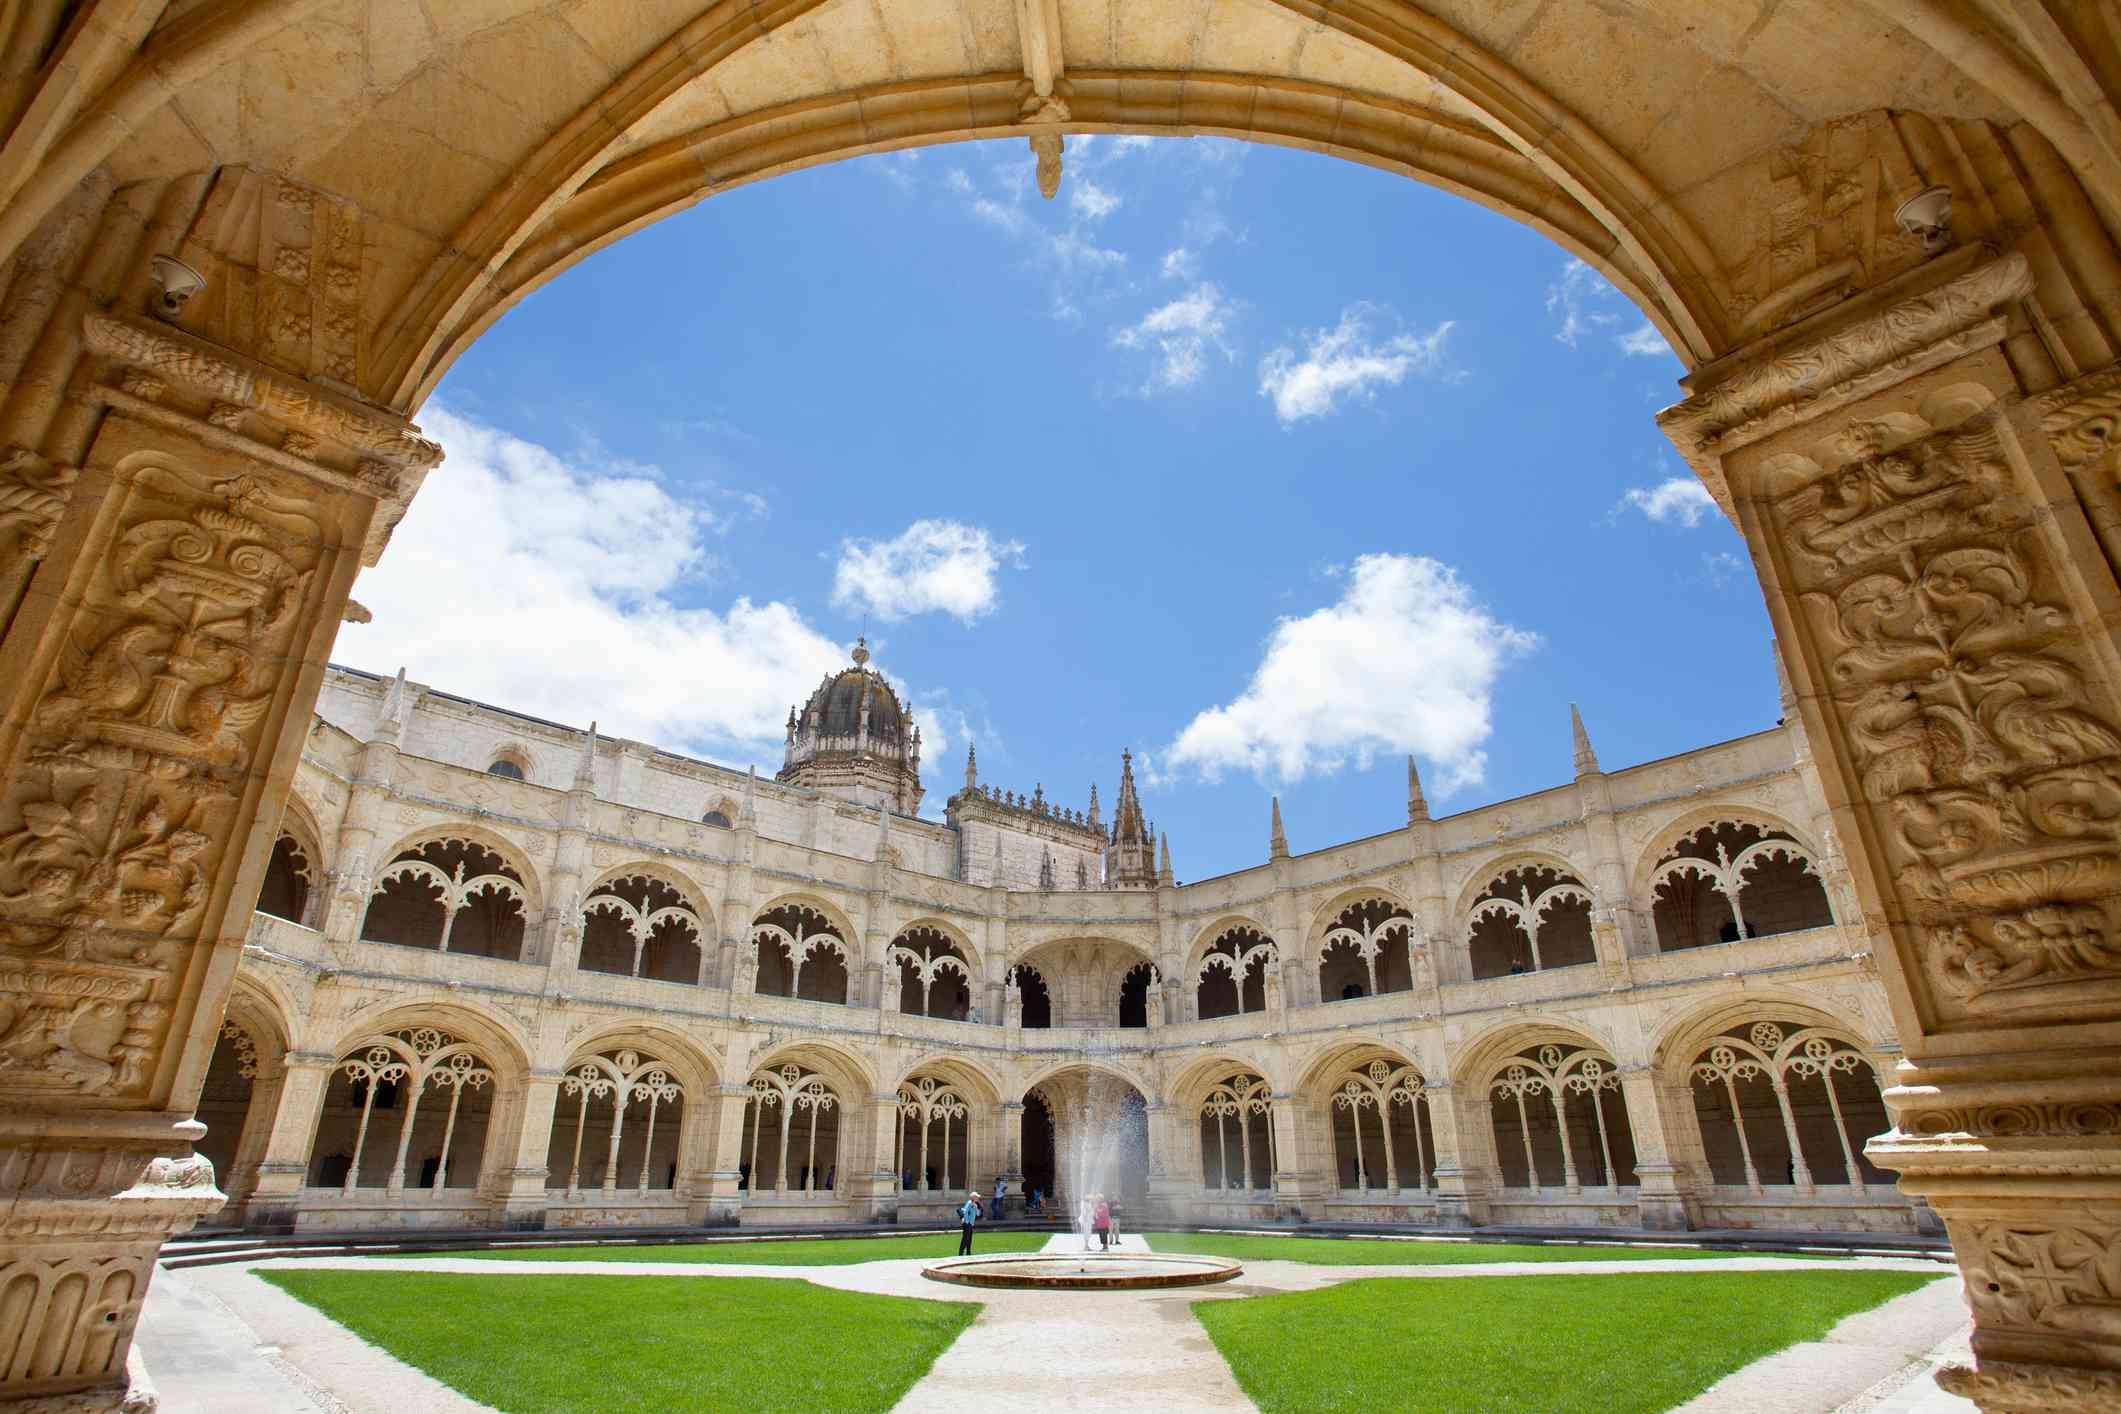 Portugal, Jeronimos Monastery at Belem in Lisbon